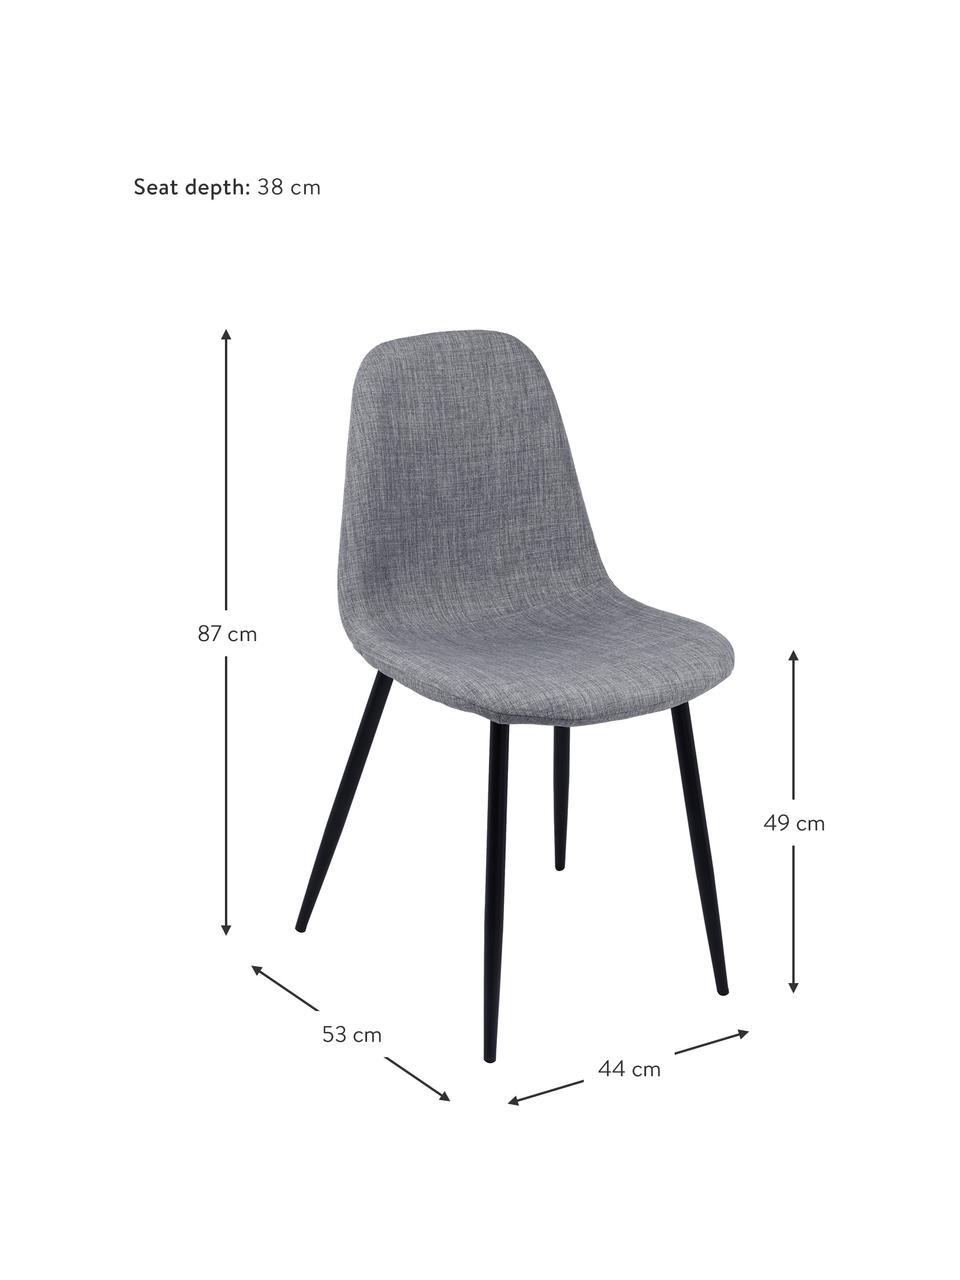 Polsterstühle Karla in Grau, 2 Stück, Bezug: 100% Polyester, Füße: Metall, Webstoff Hellgrau, B 44 x T 53 cm